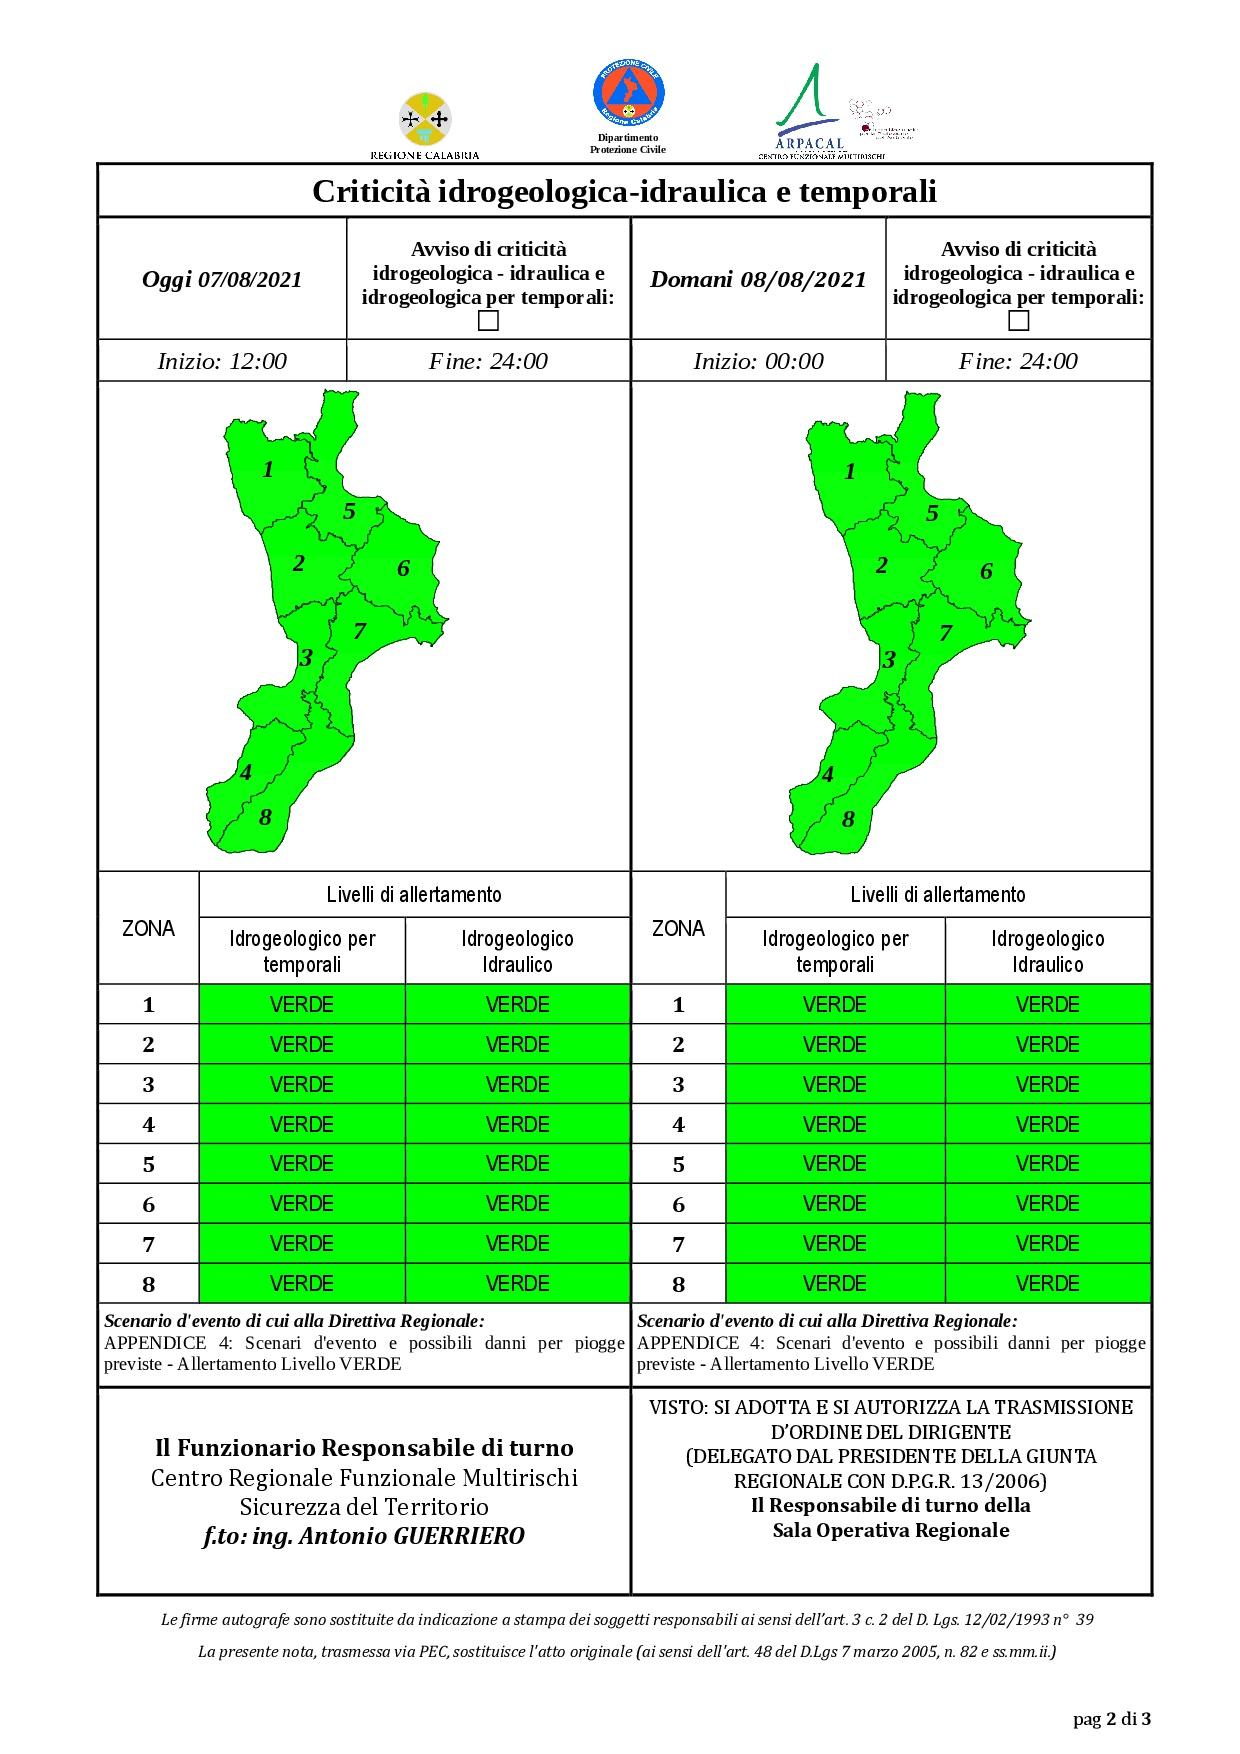 Criticità idrogeologica-idraulica e temporali in Calabria 07-08-2021